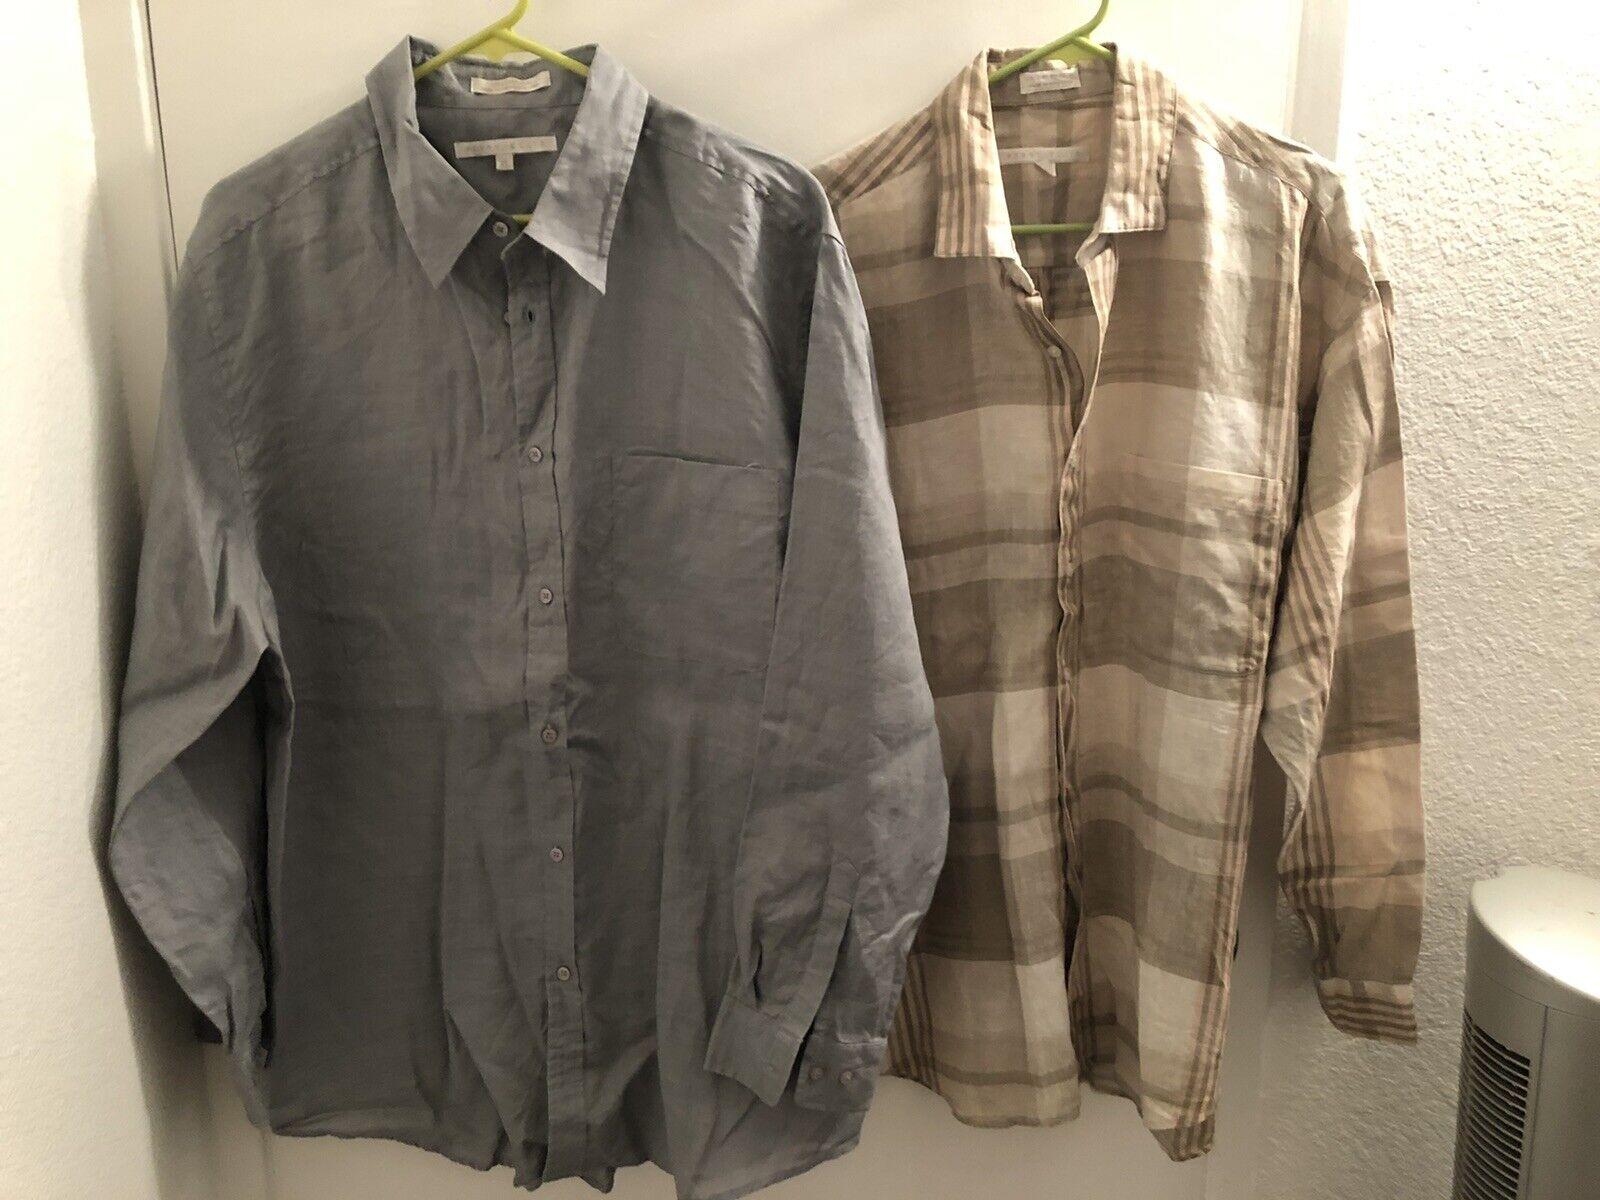 Lot Of TWO Perry Ellis Linen Dress Shirts XL Vint… - image 1